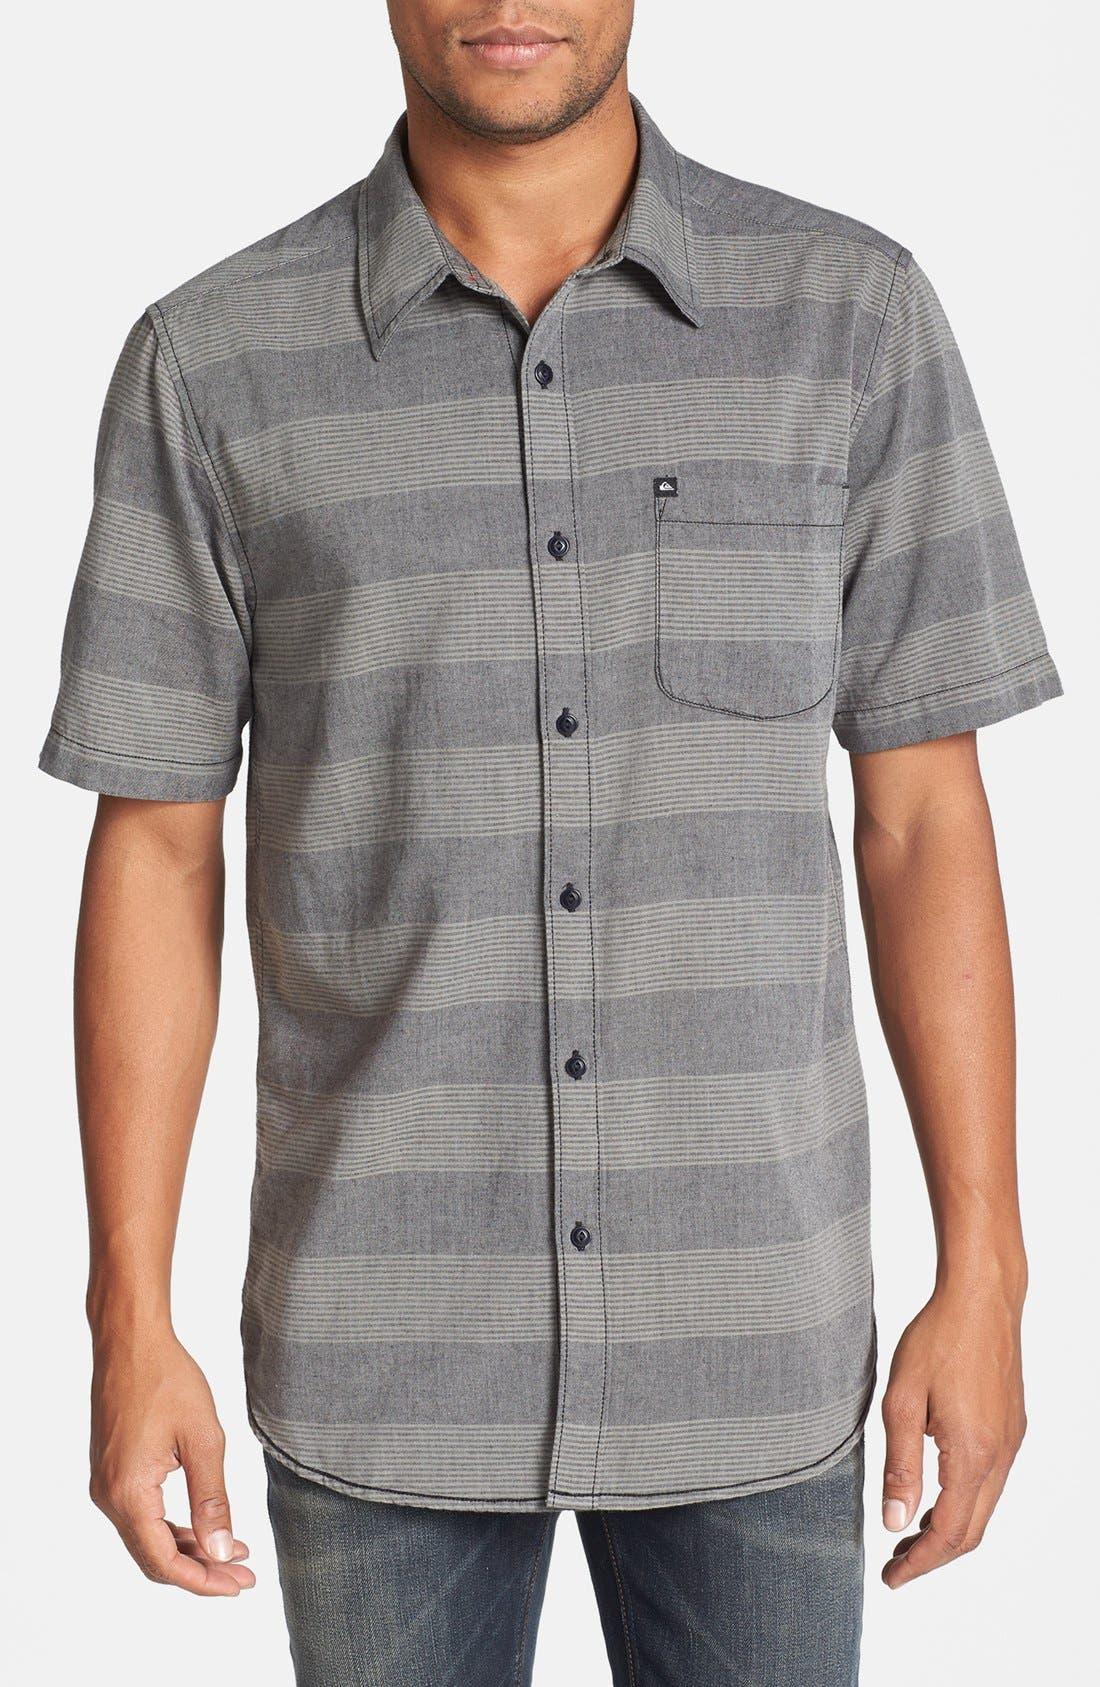 Main Image - Quiksilver 'Tube Release' Stripe Short Sleeve Shirt